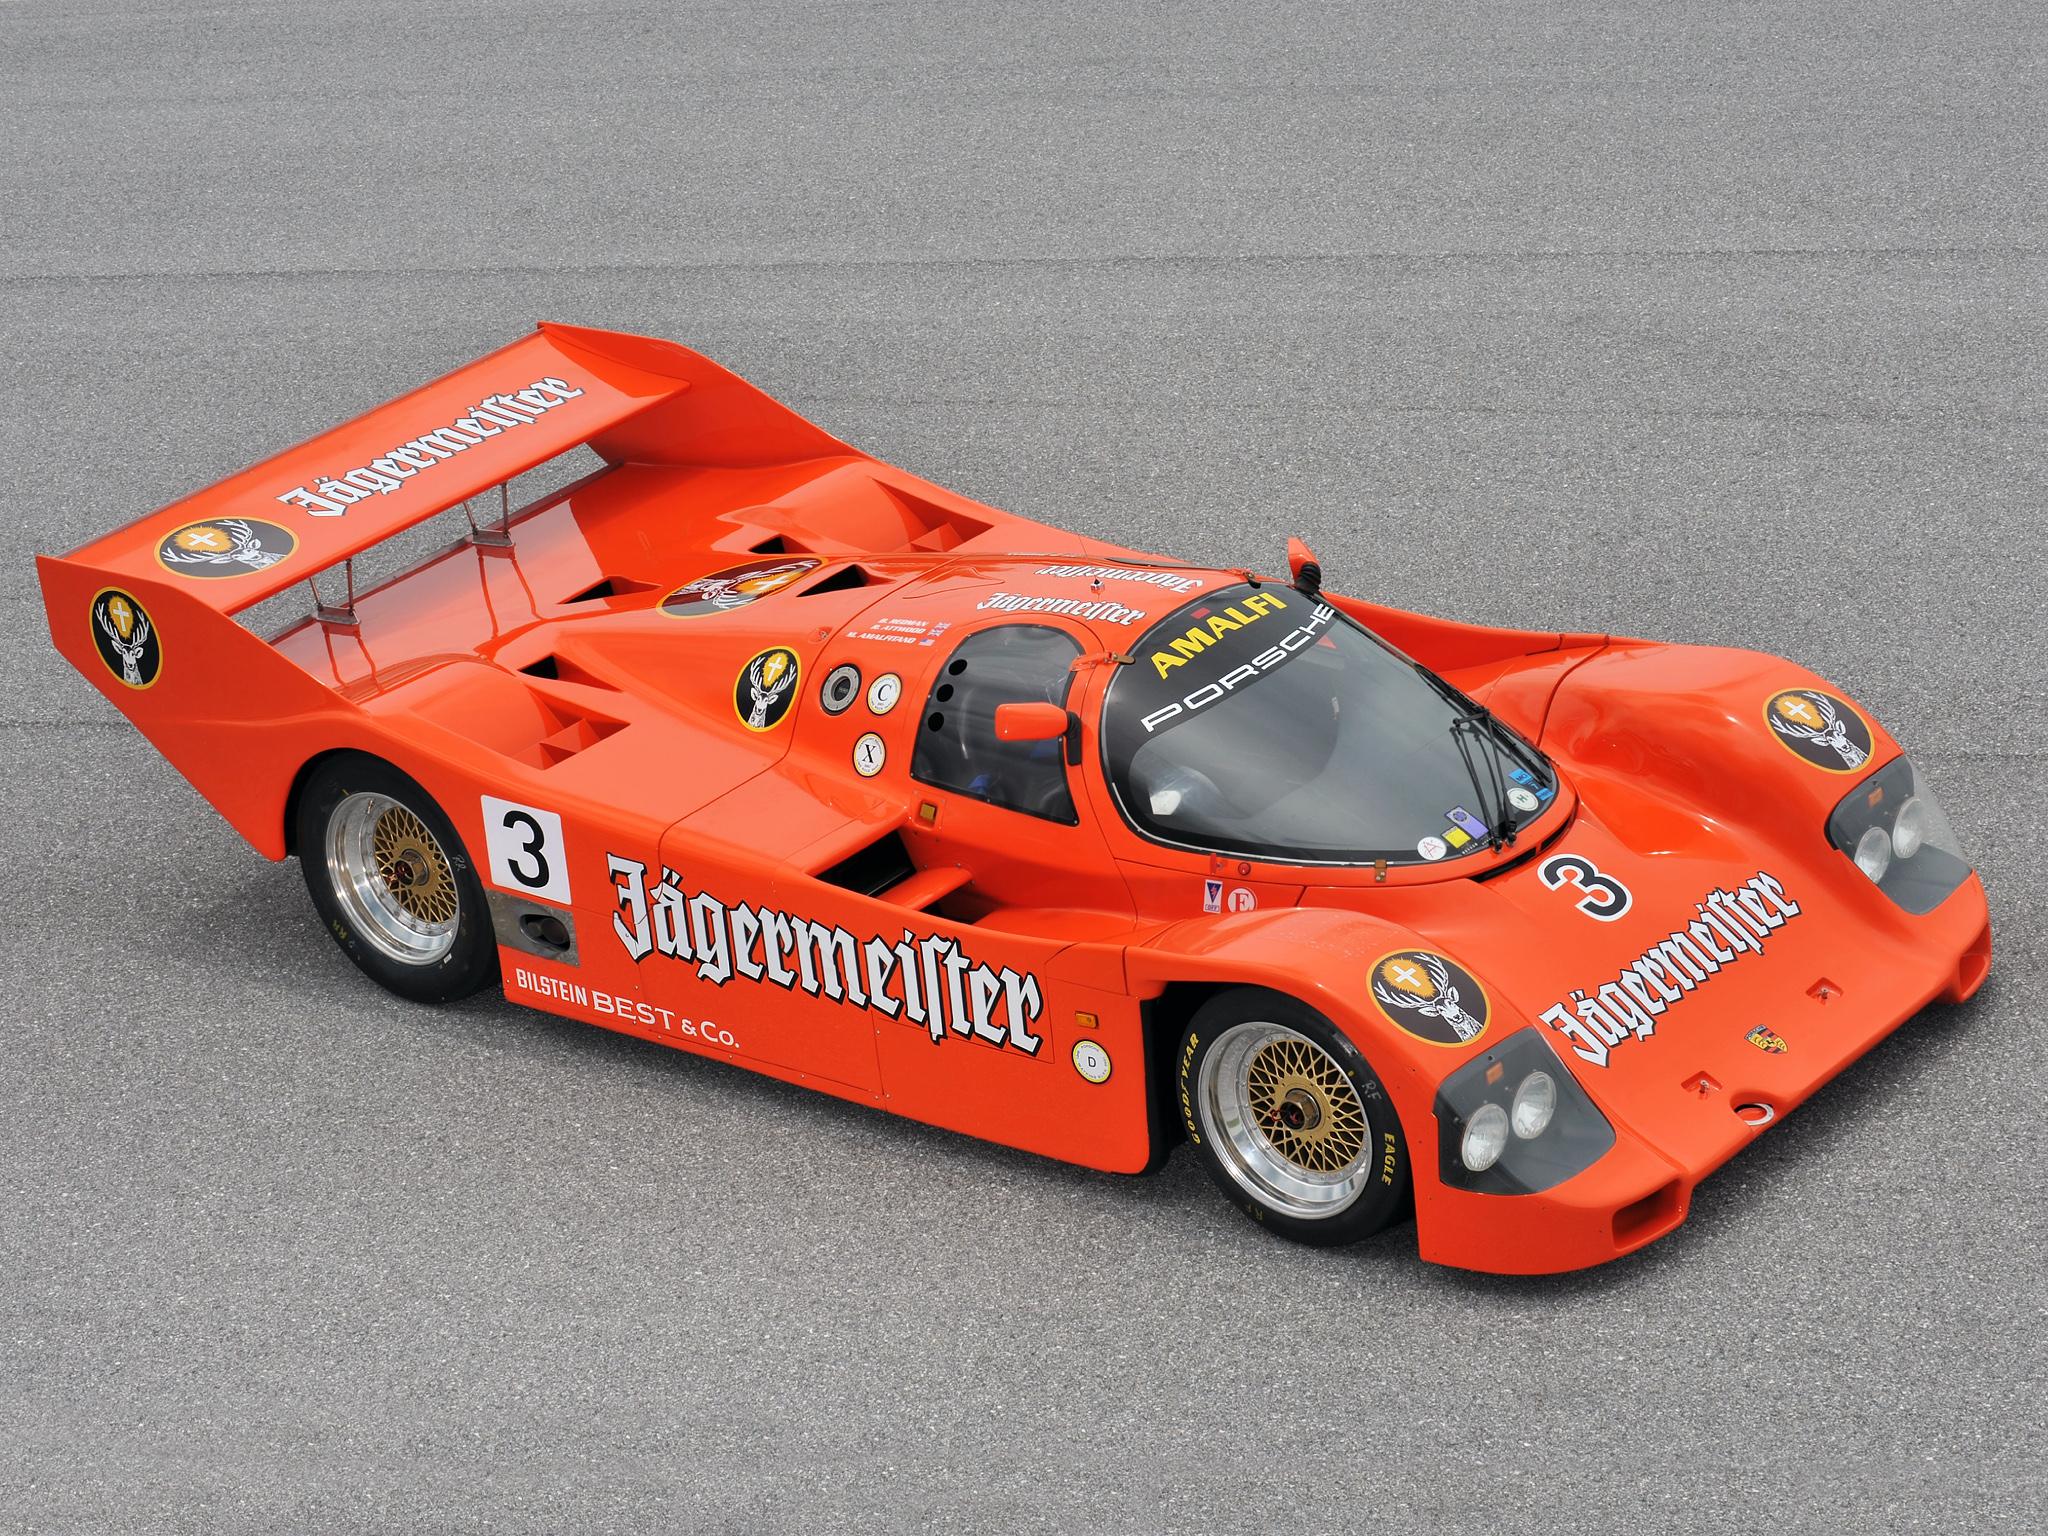 19841993 Porsche 962 Dark Cars Wallpapers